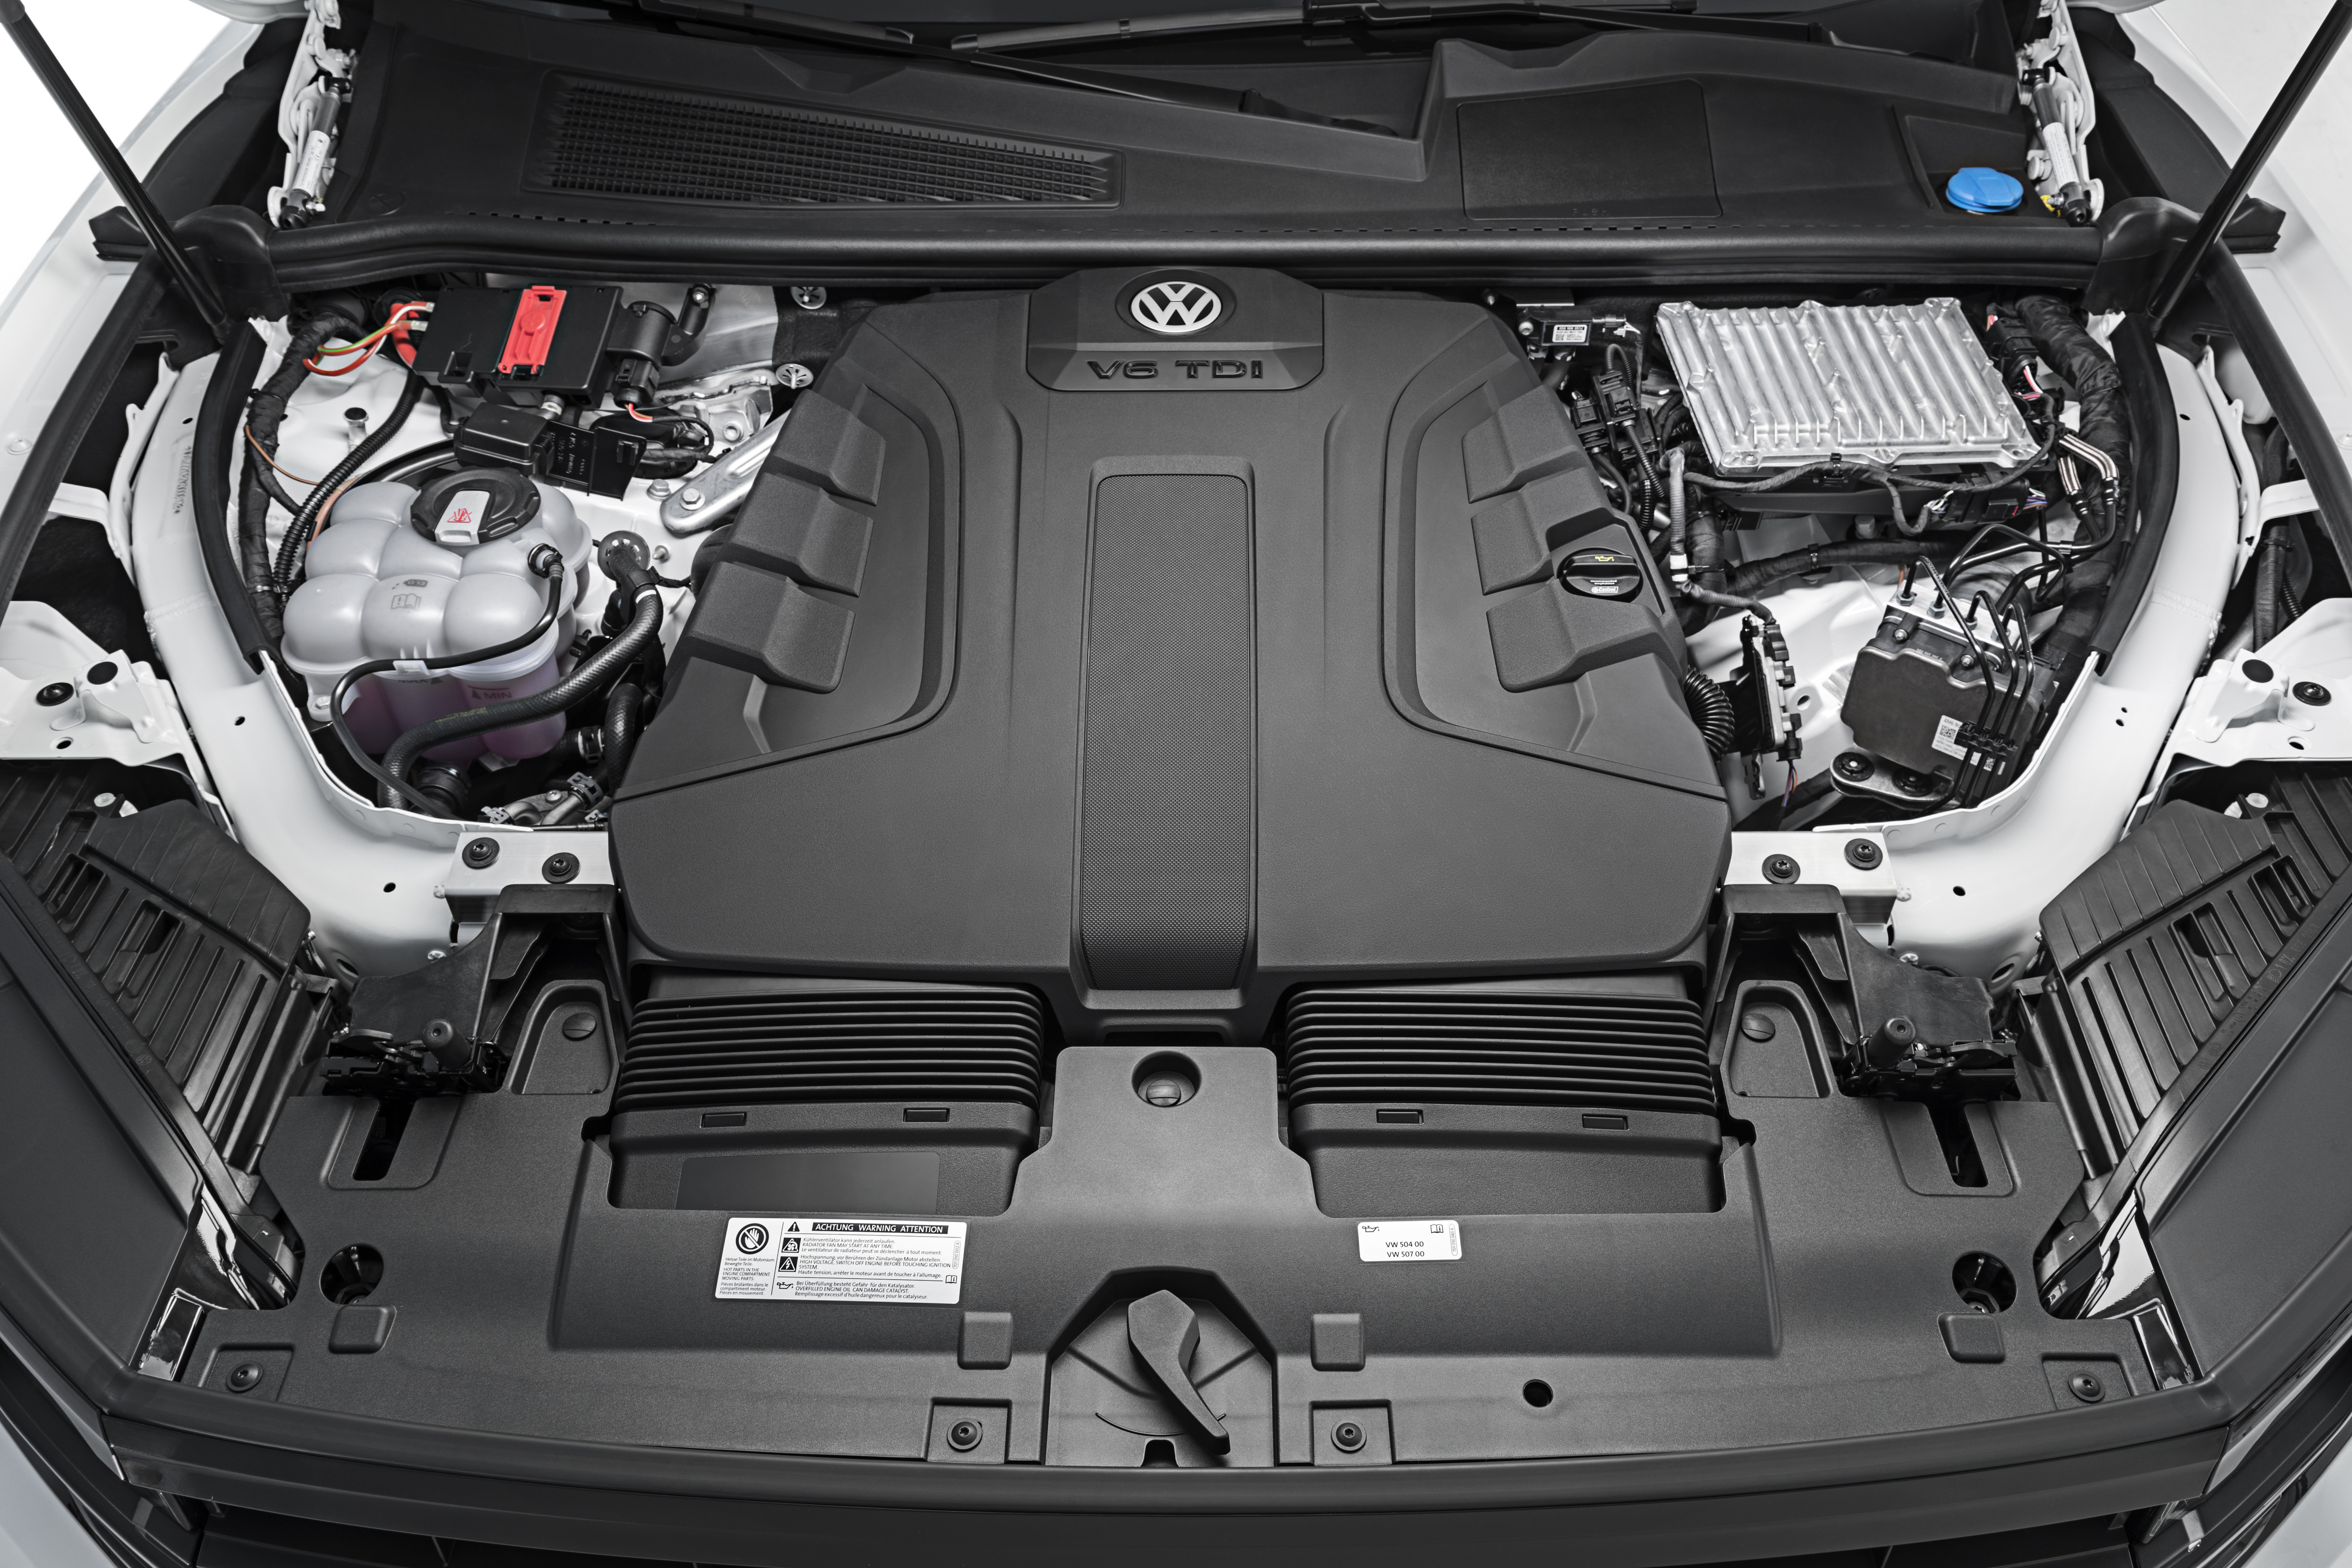 2018 Volkswagen Touareg #480367 - Best quality free high